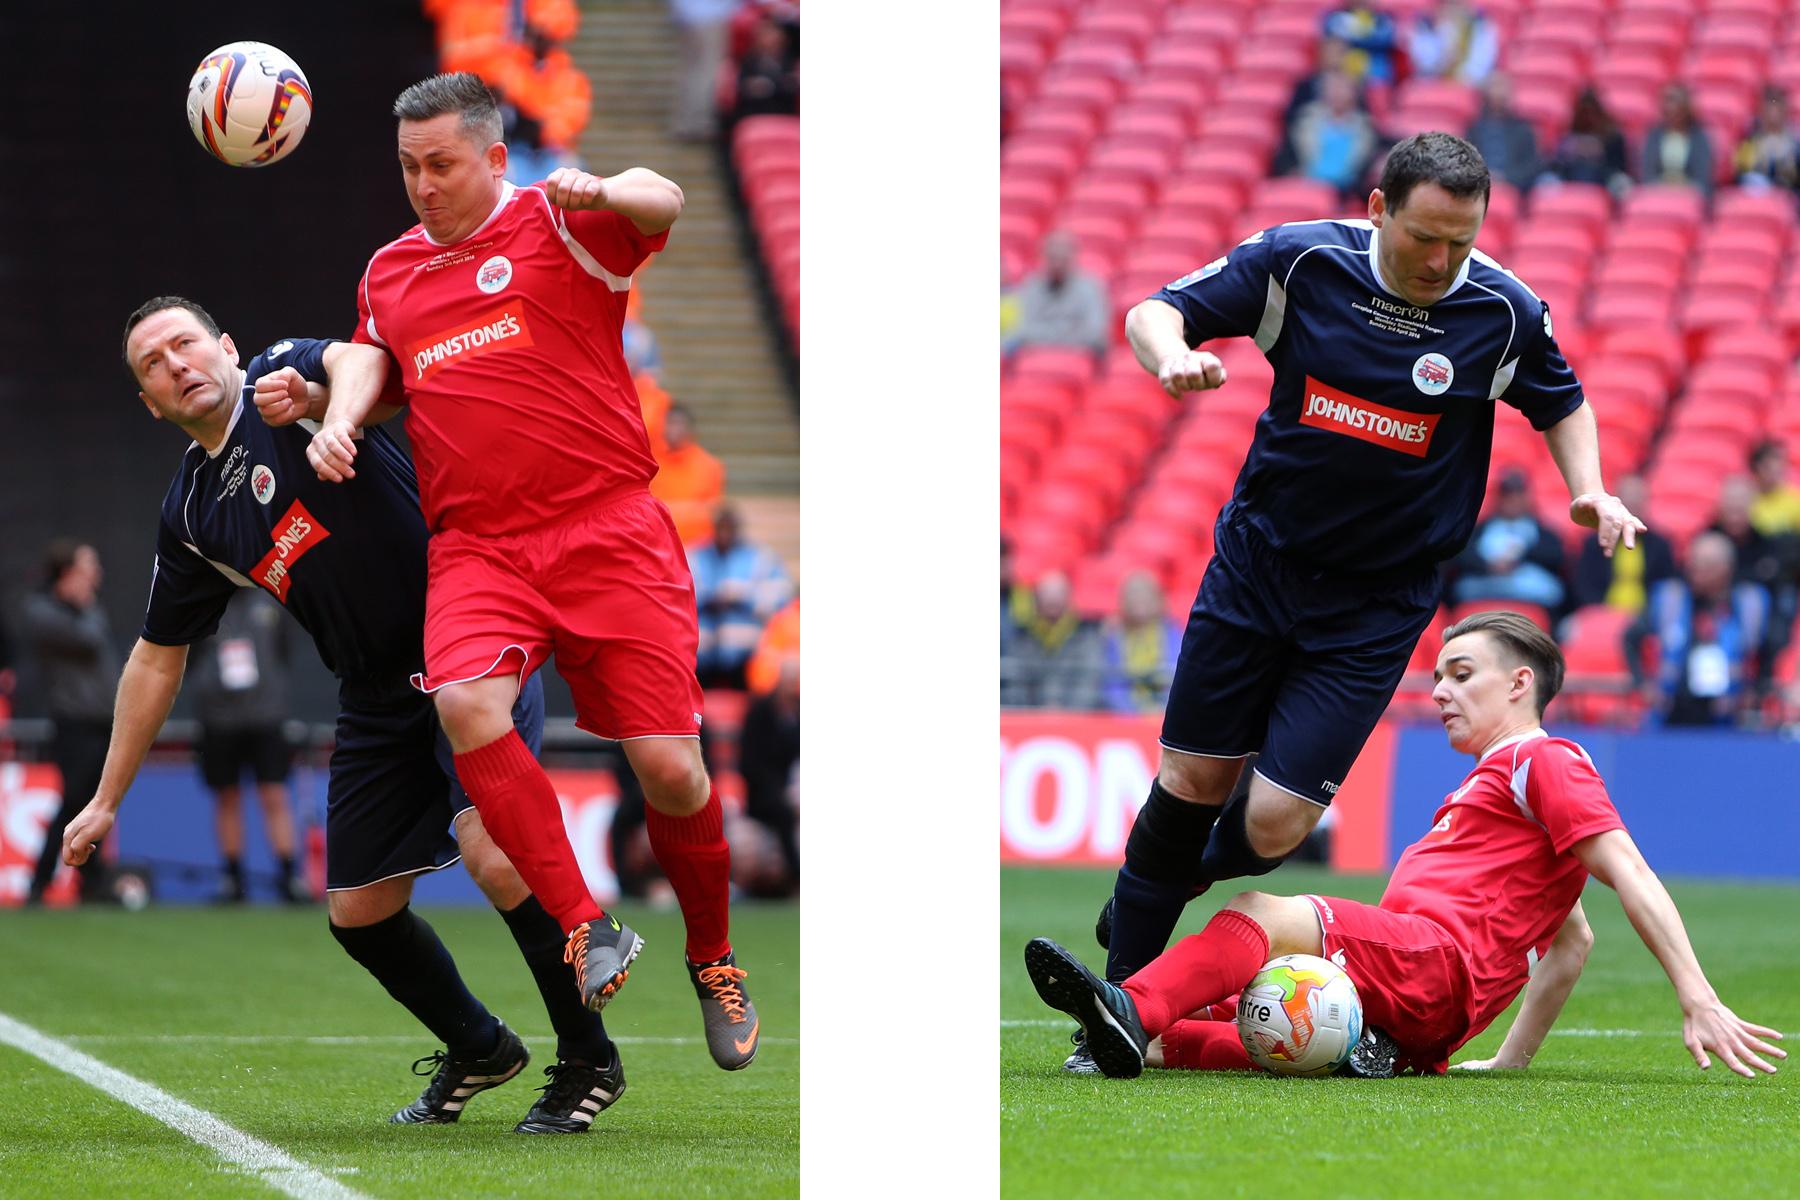 PR_Wembley10.jpg